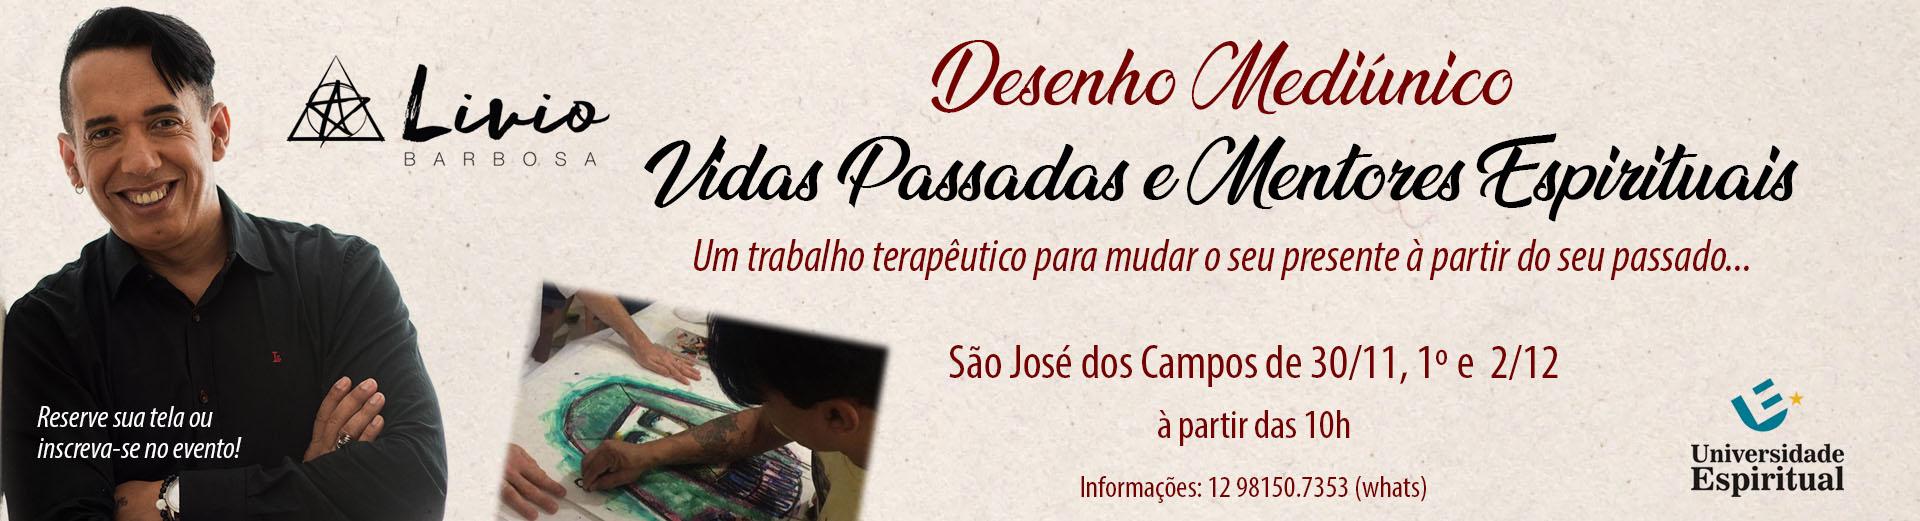 Livio Barbosa